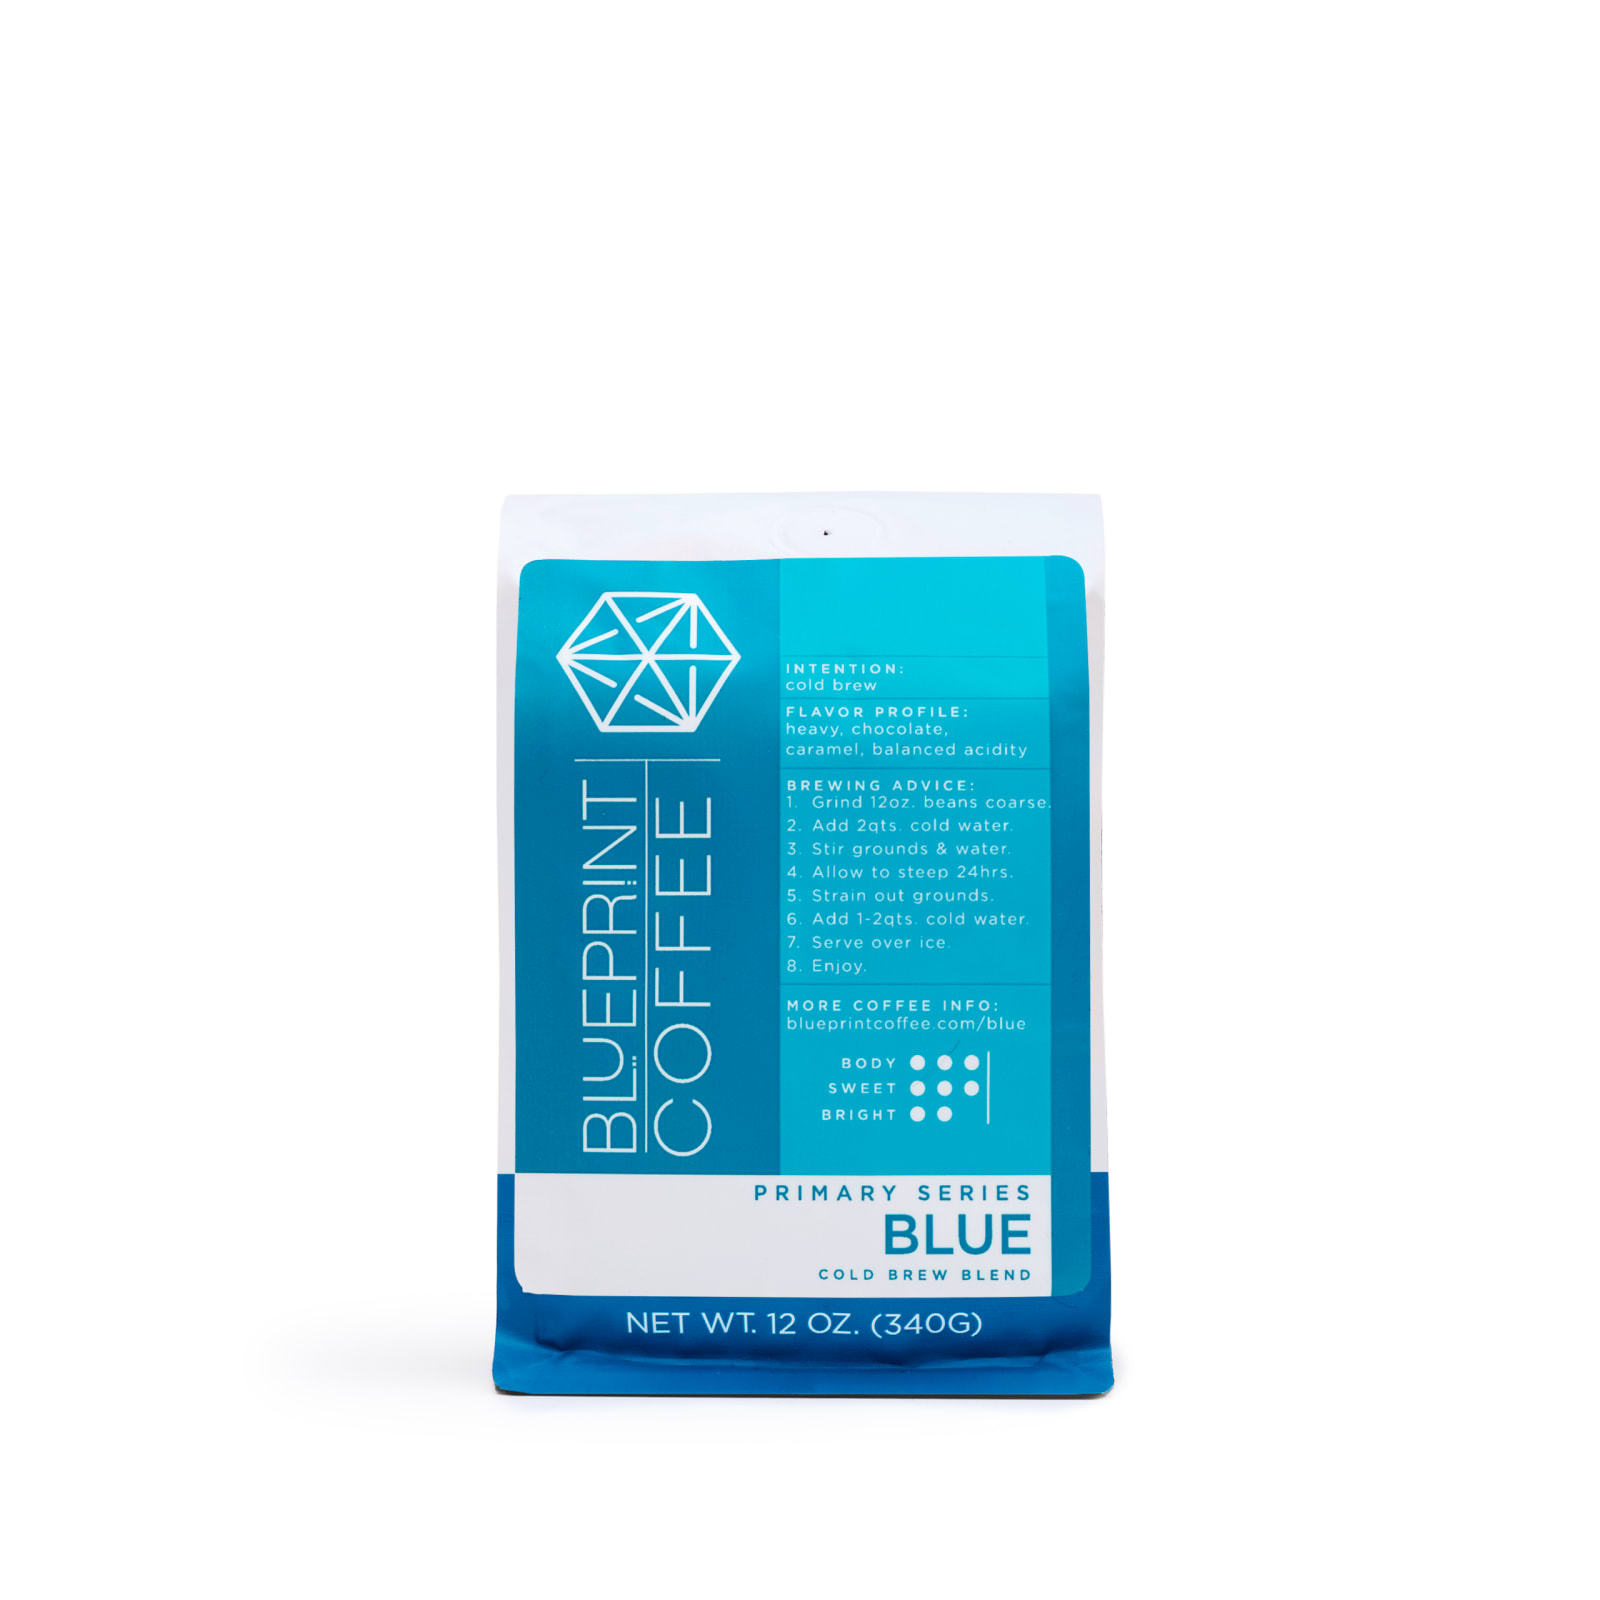 Primary Series: Blue